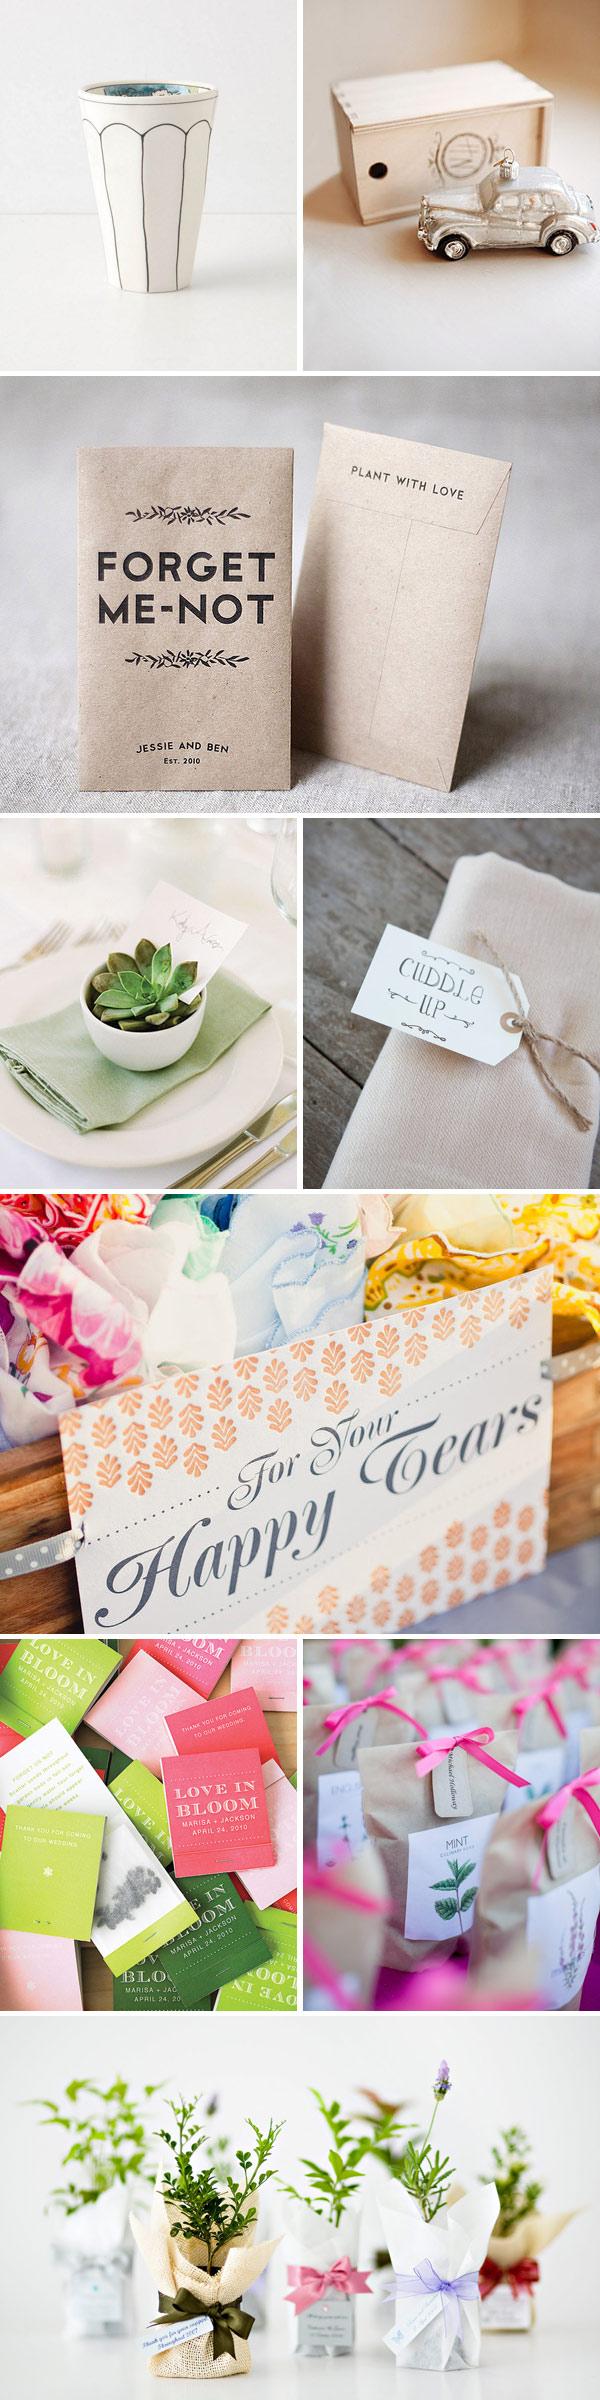 Inexpensive Wedding Favor Ideas 39 Good Treasured Memories